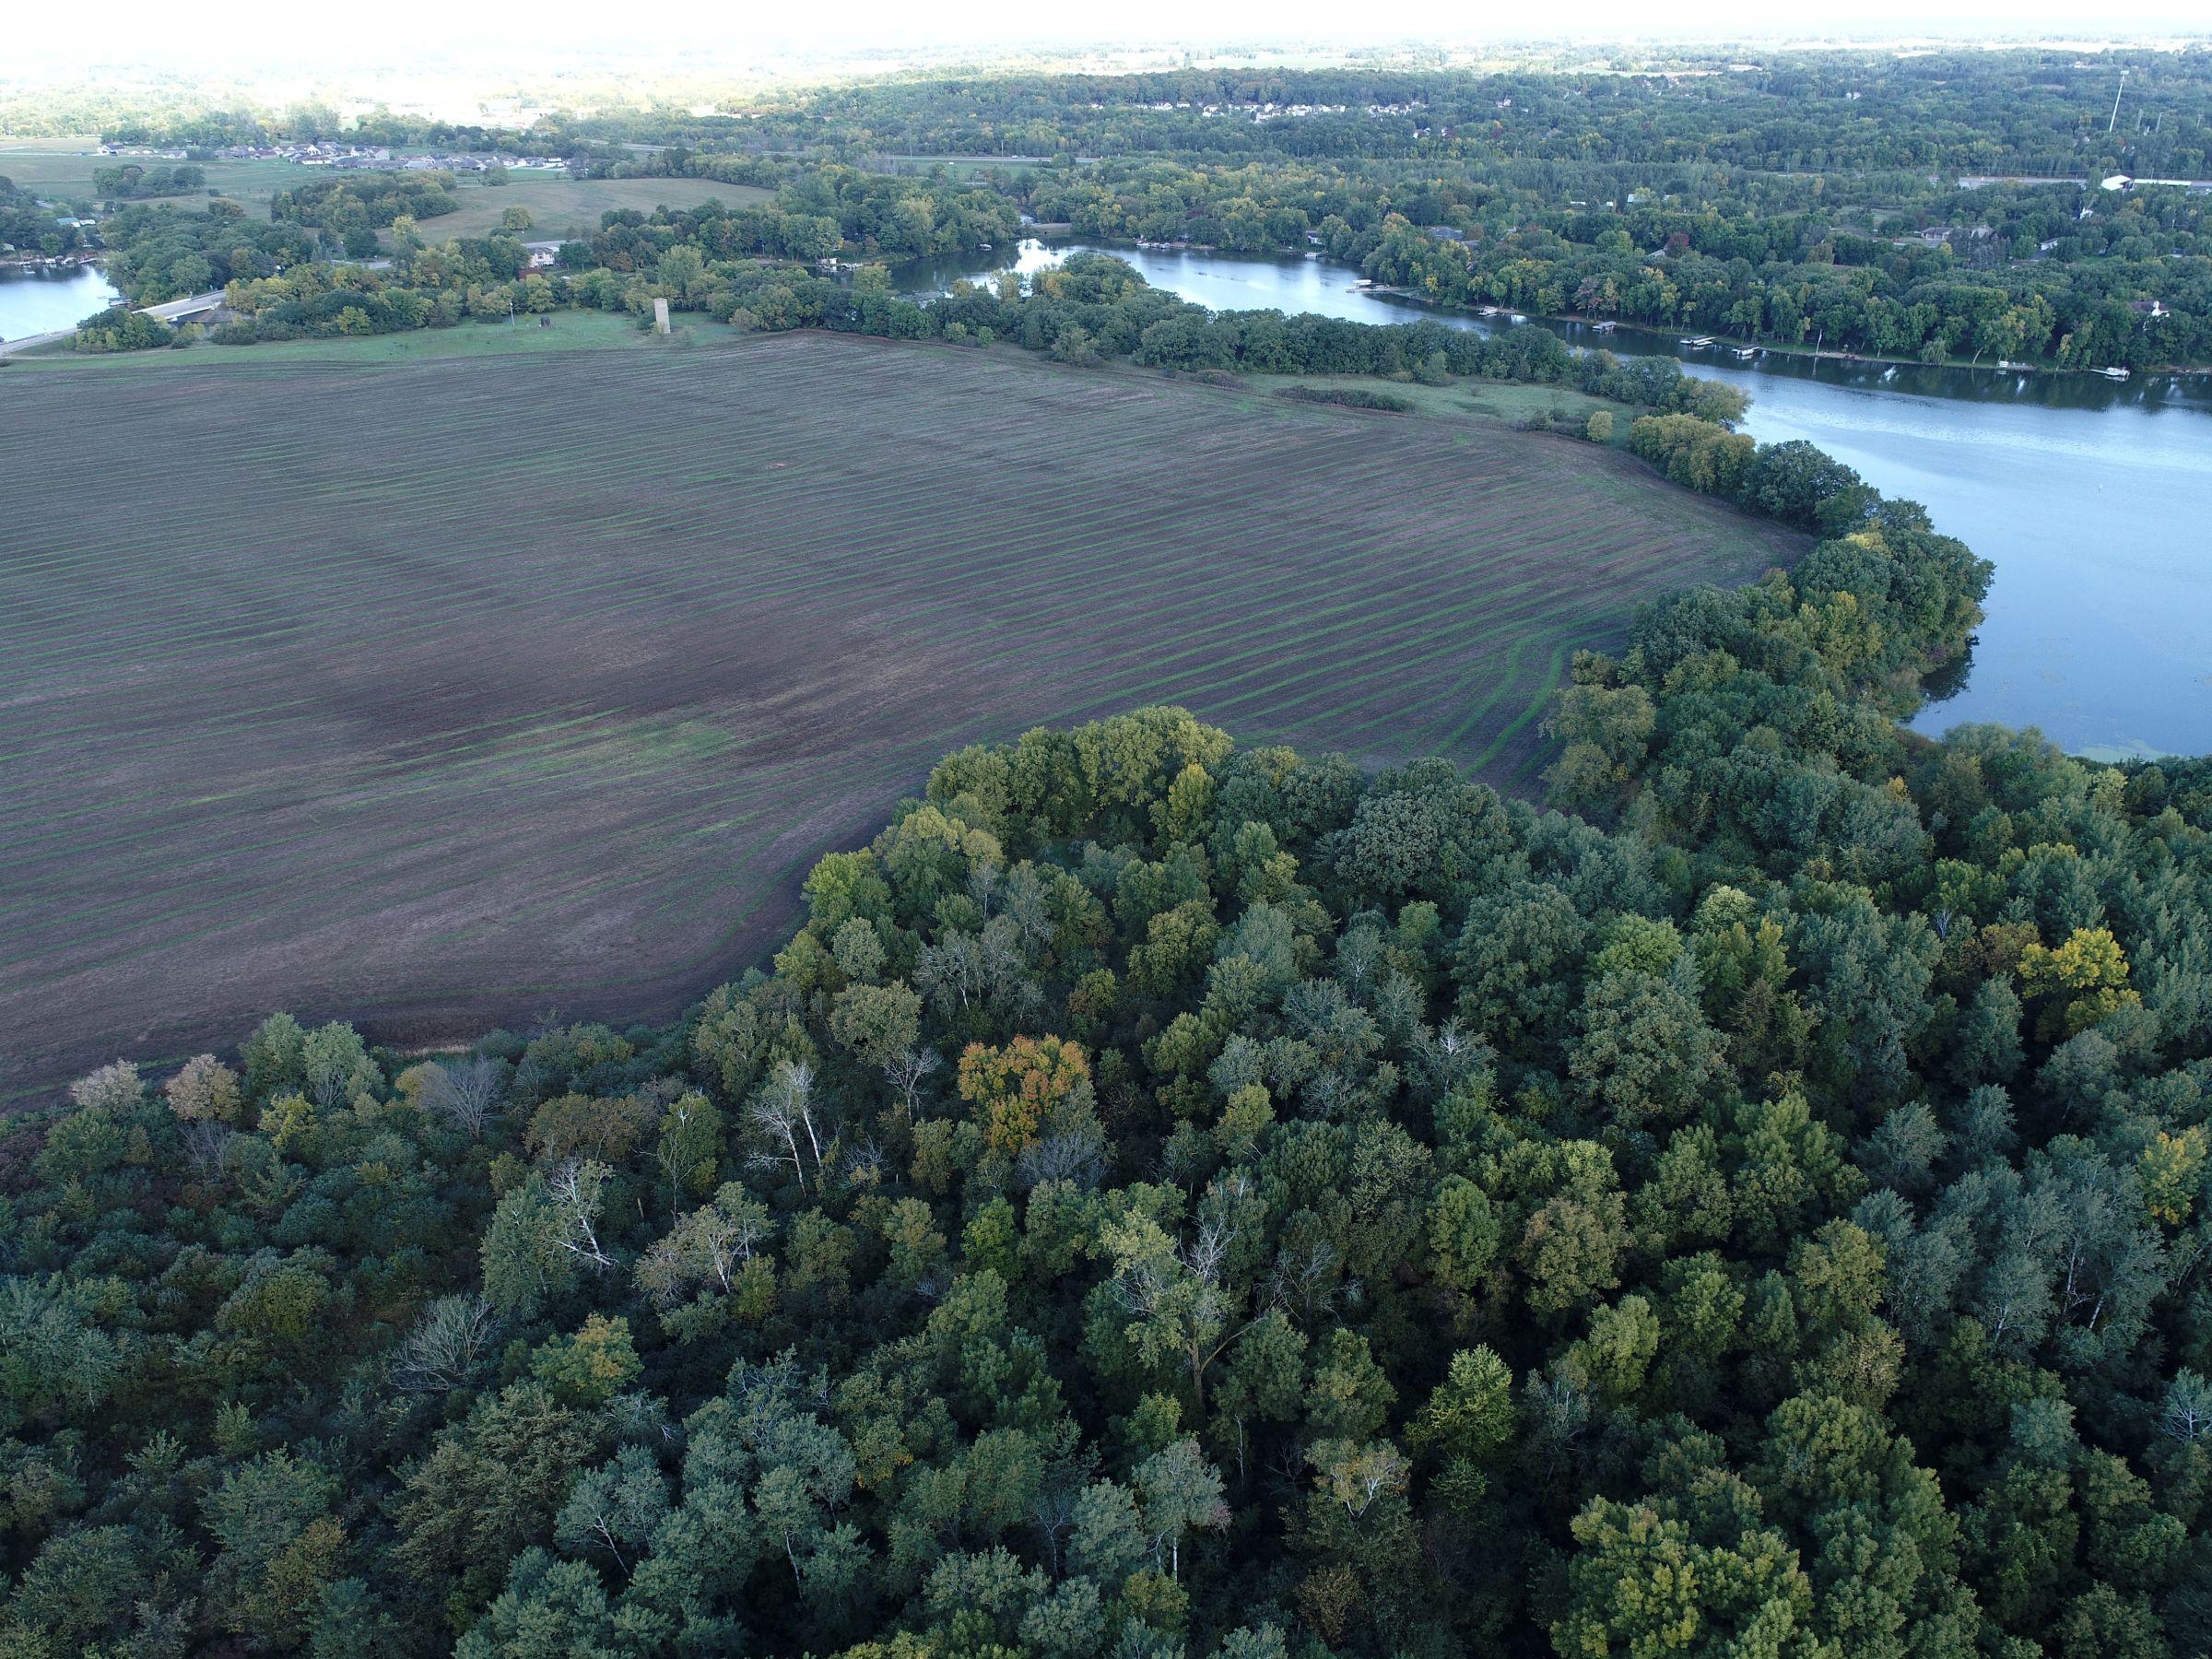 land-stearns-county-minnesota-298-acres-listing-number-15712-3-2021-09-23-123701.JPG